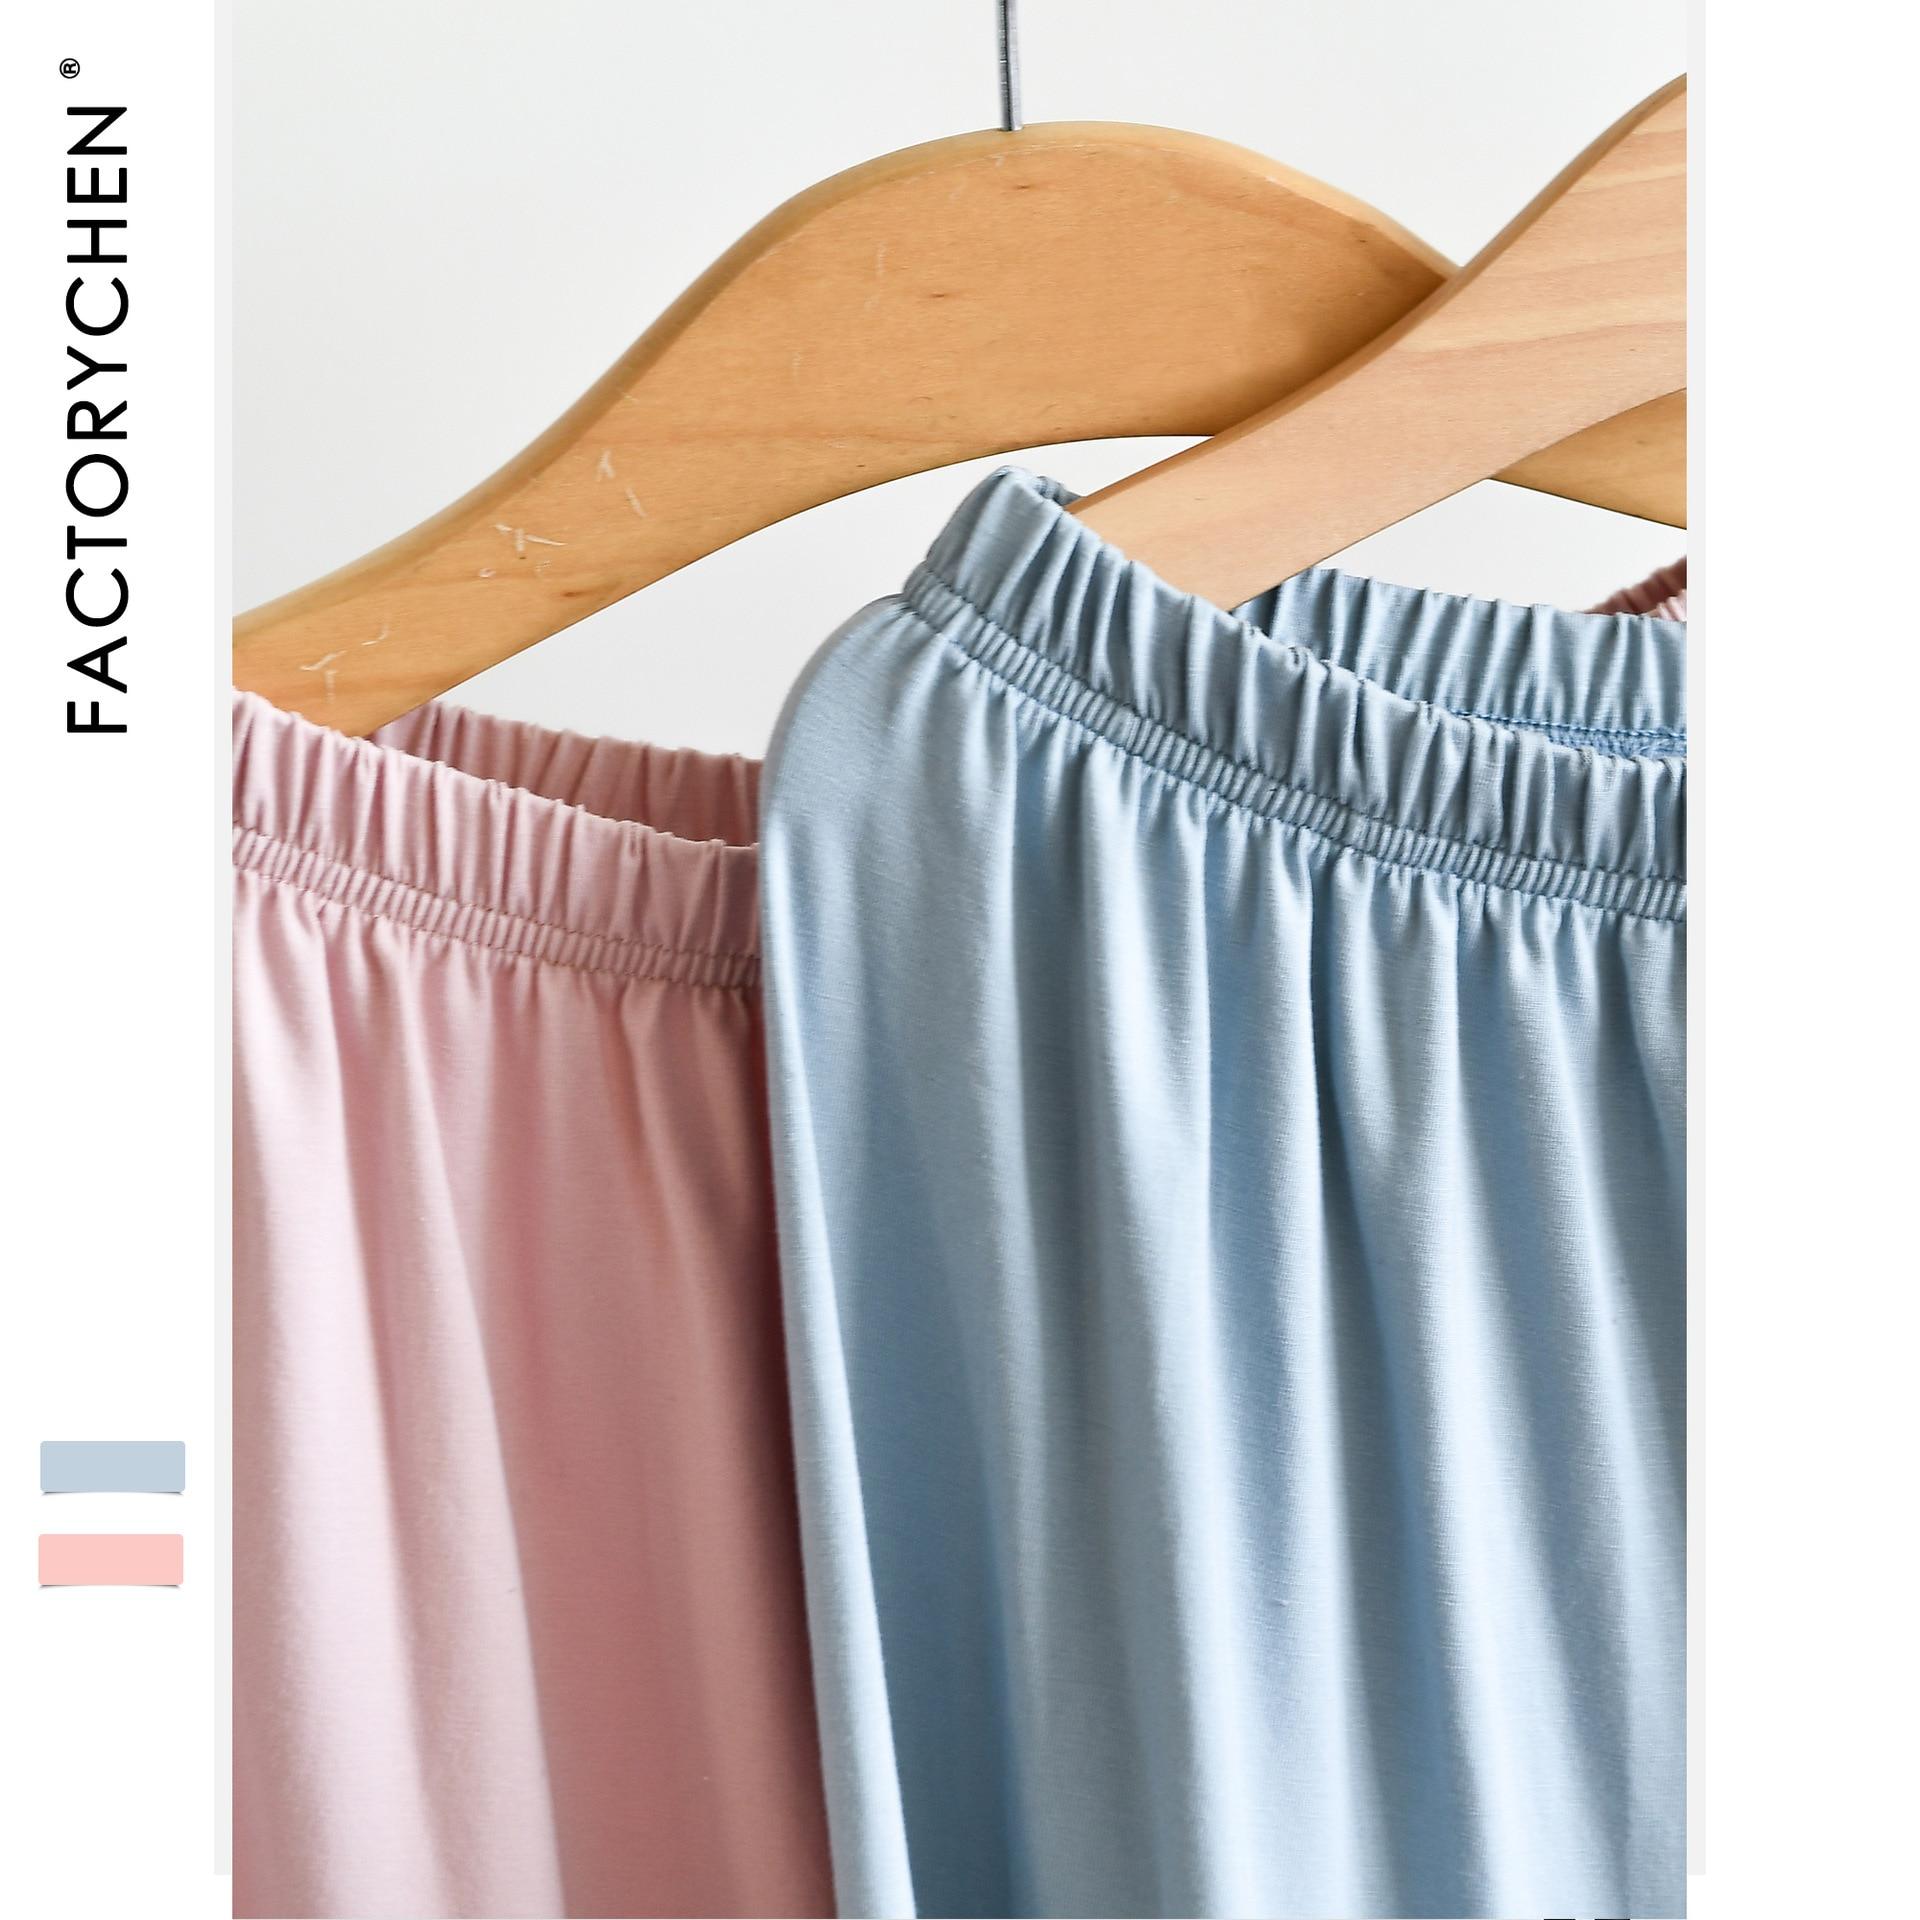 Summer Female Loose Plus Size Sleep Bottoms Comfortable Good Material Elastic Ammonia + Cotton Thin Household Sleepwear Pants 4